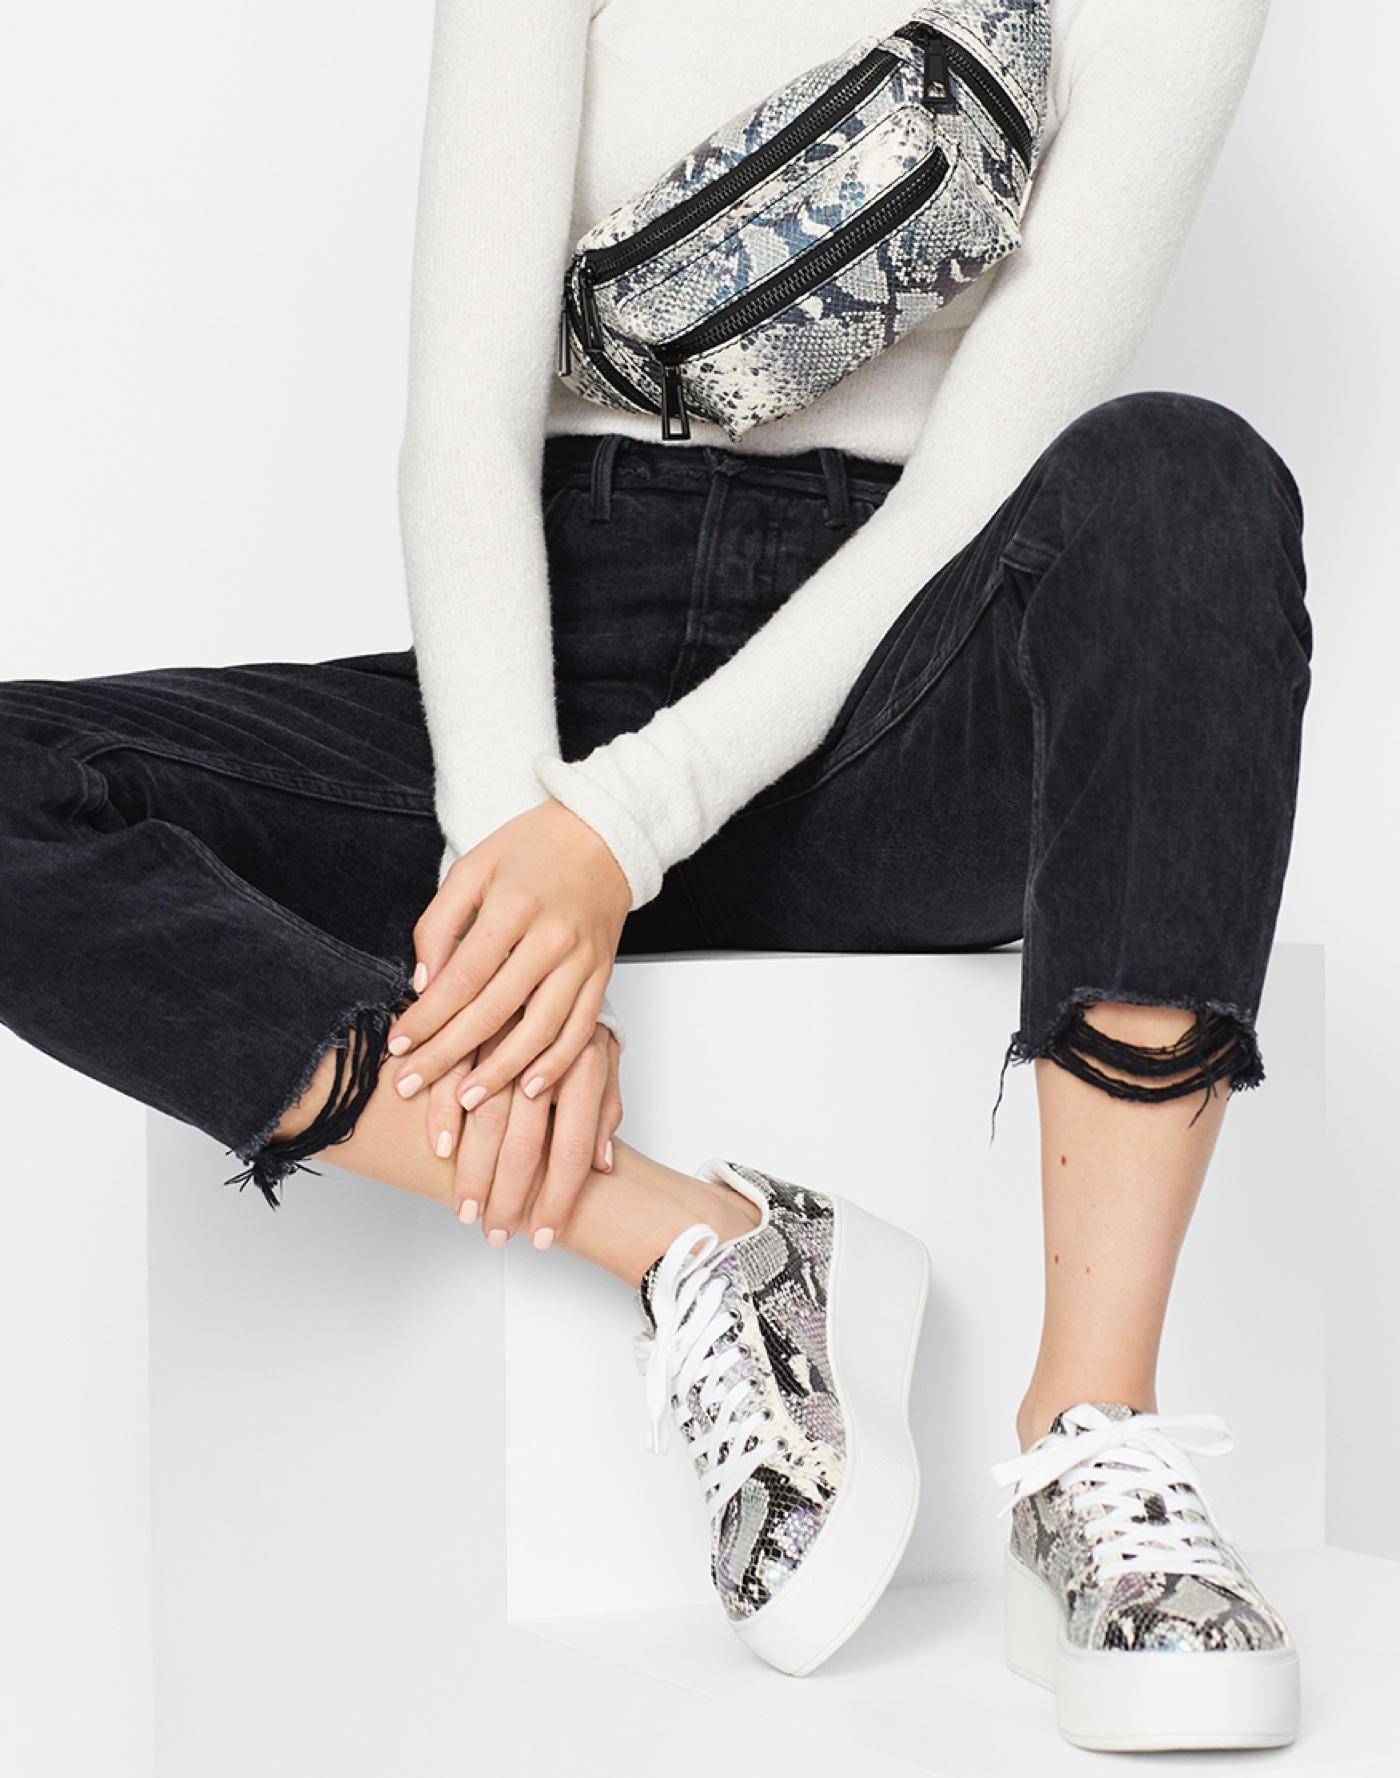 d126a16ee7 Women's Shoes, Boots, Sandals, Handbags and Accessories | ALDO US ...